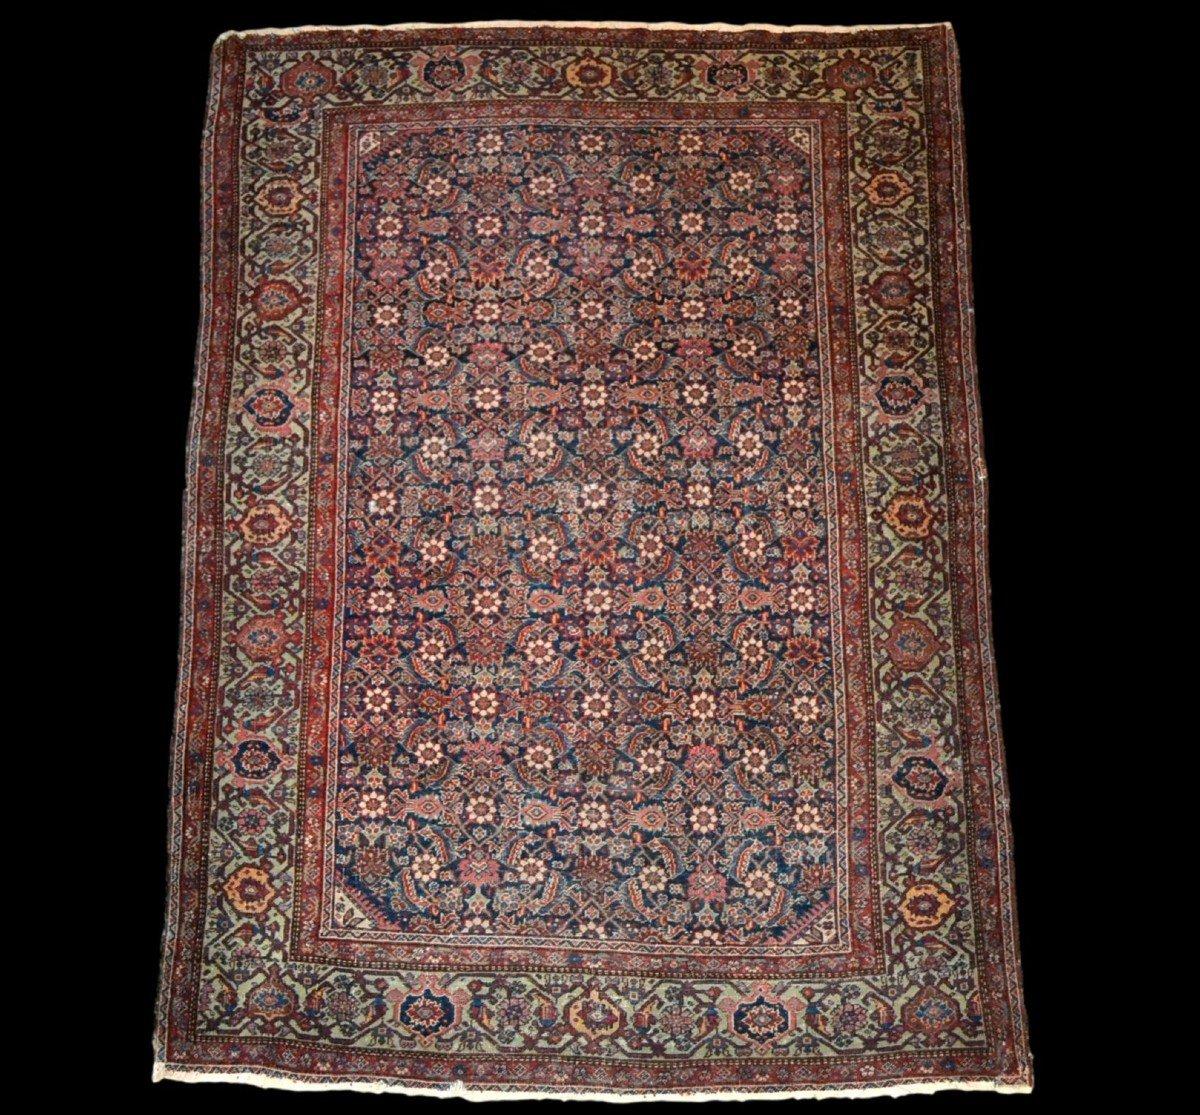 Tapis Persan Feraghan ancien, 131 cm x 185 cm, Iran, XIXème siècle, bel état collection